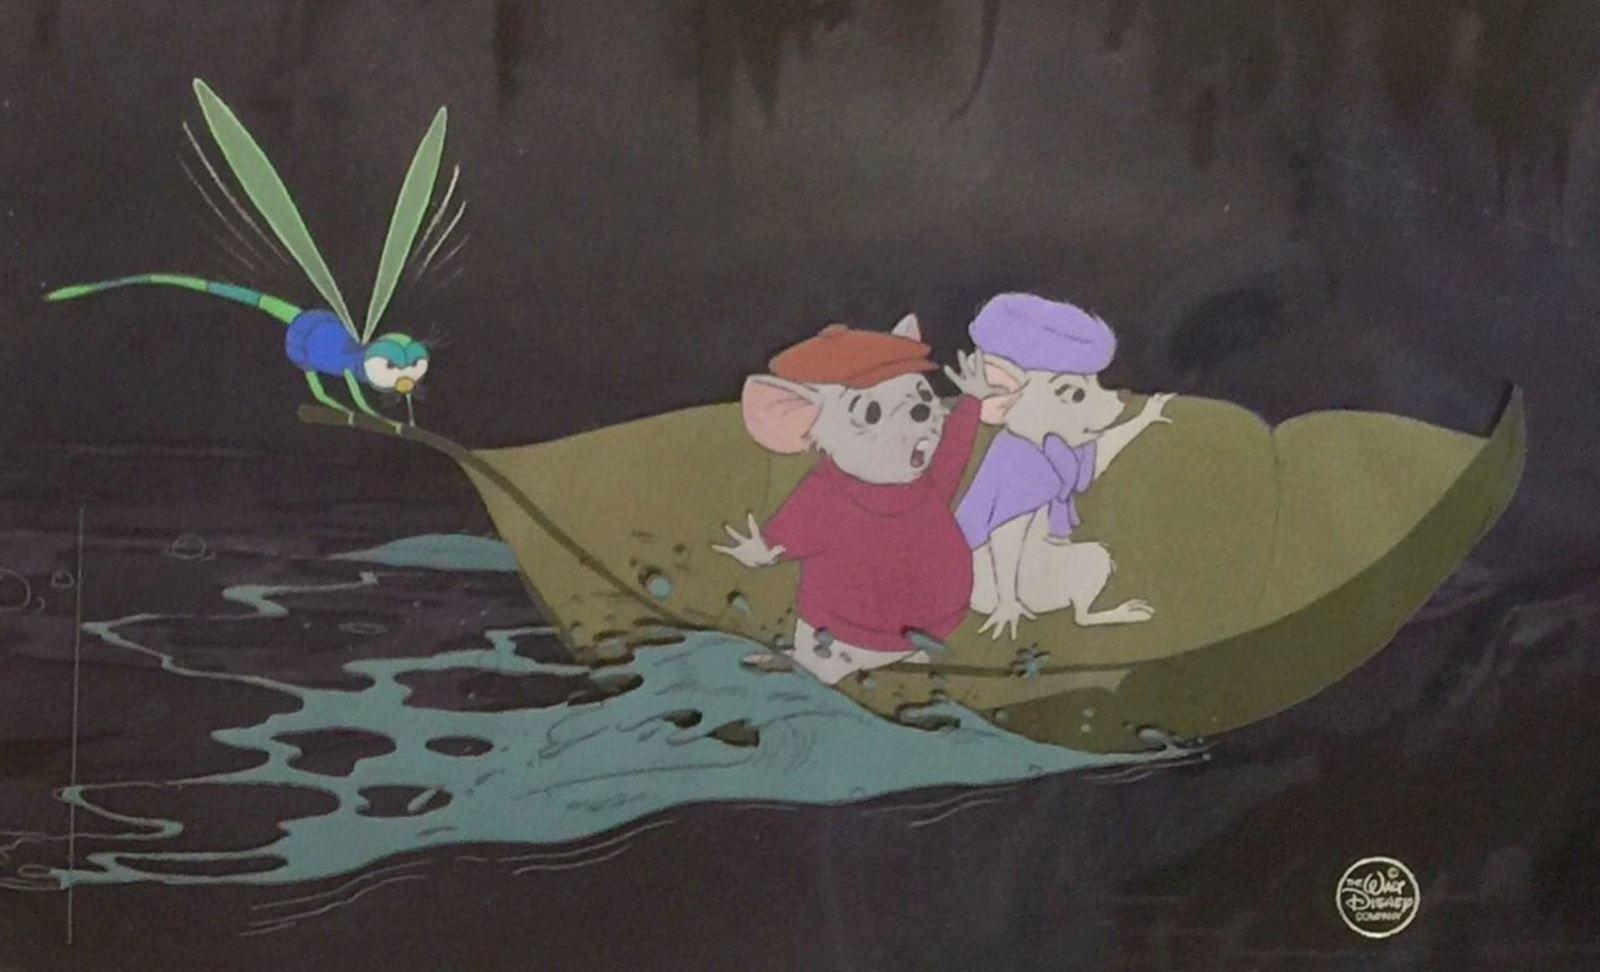 The Evinrude dragonfly, in the cartoon Bernard and Bianca of Walt Disney